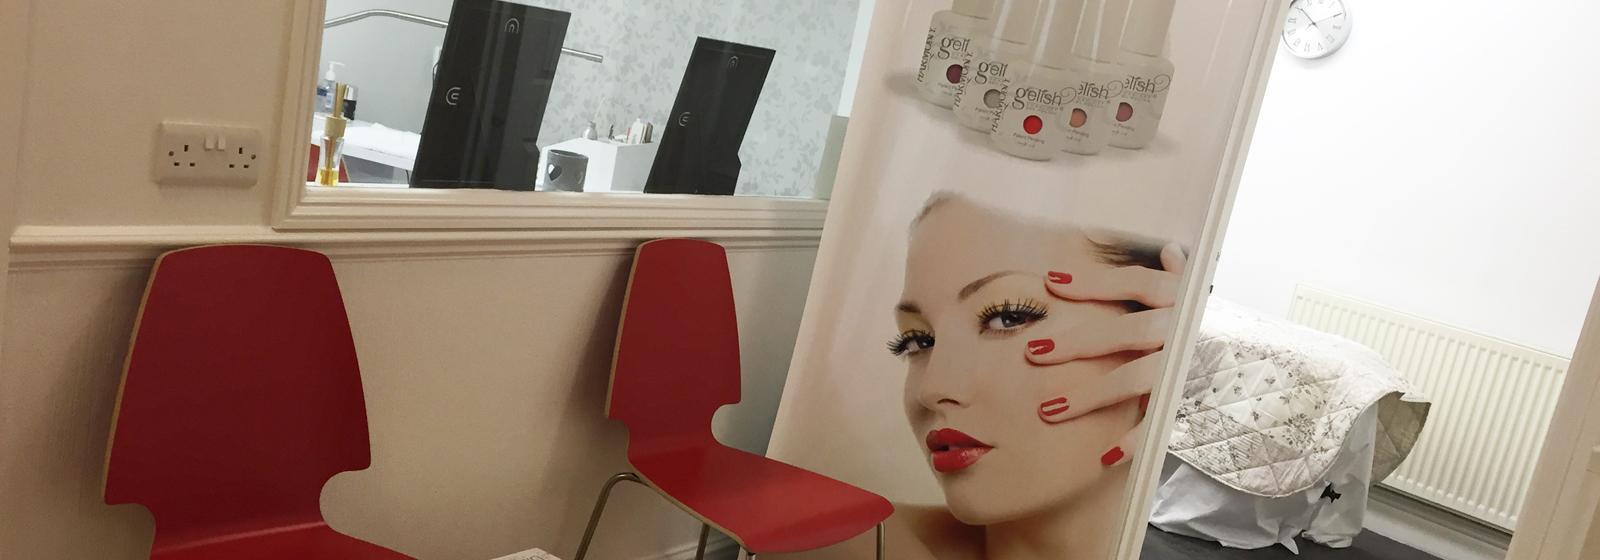 Zoes Salon - Beauty Treatments